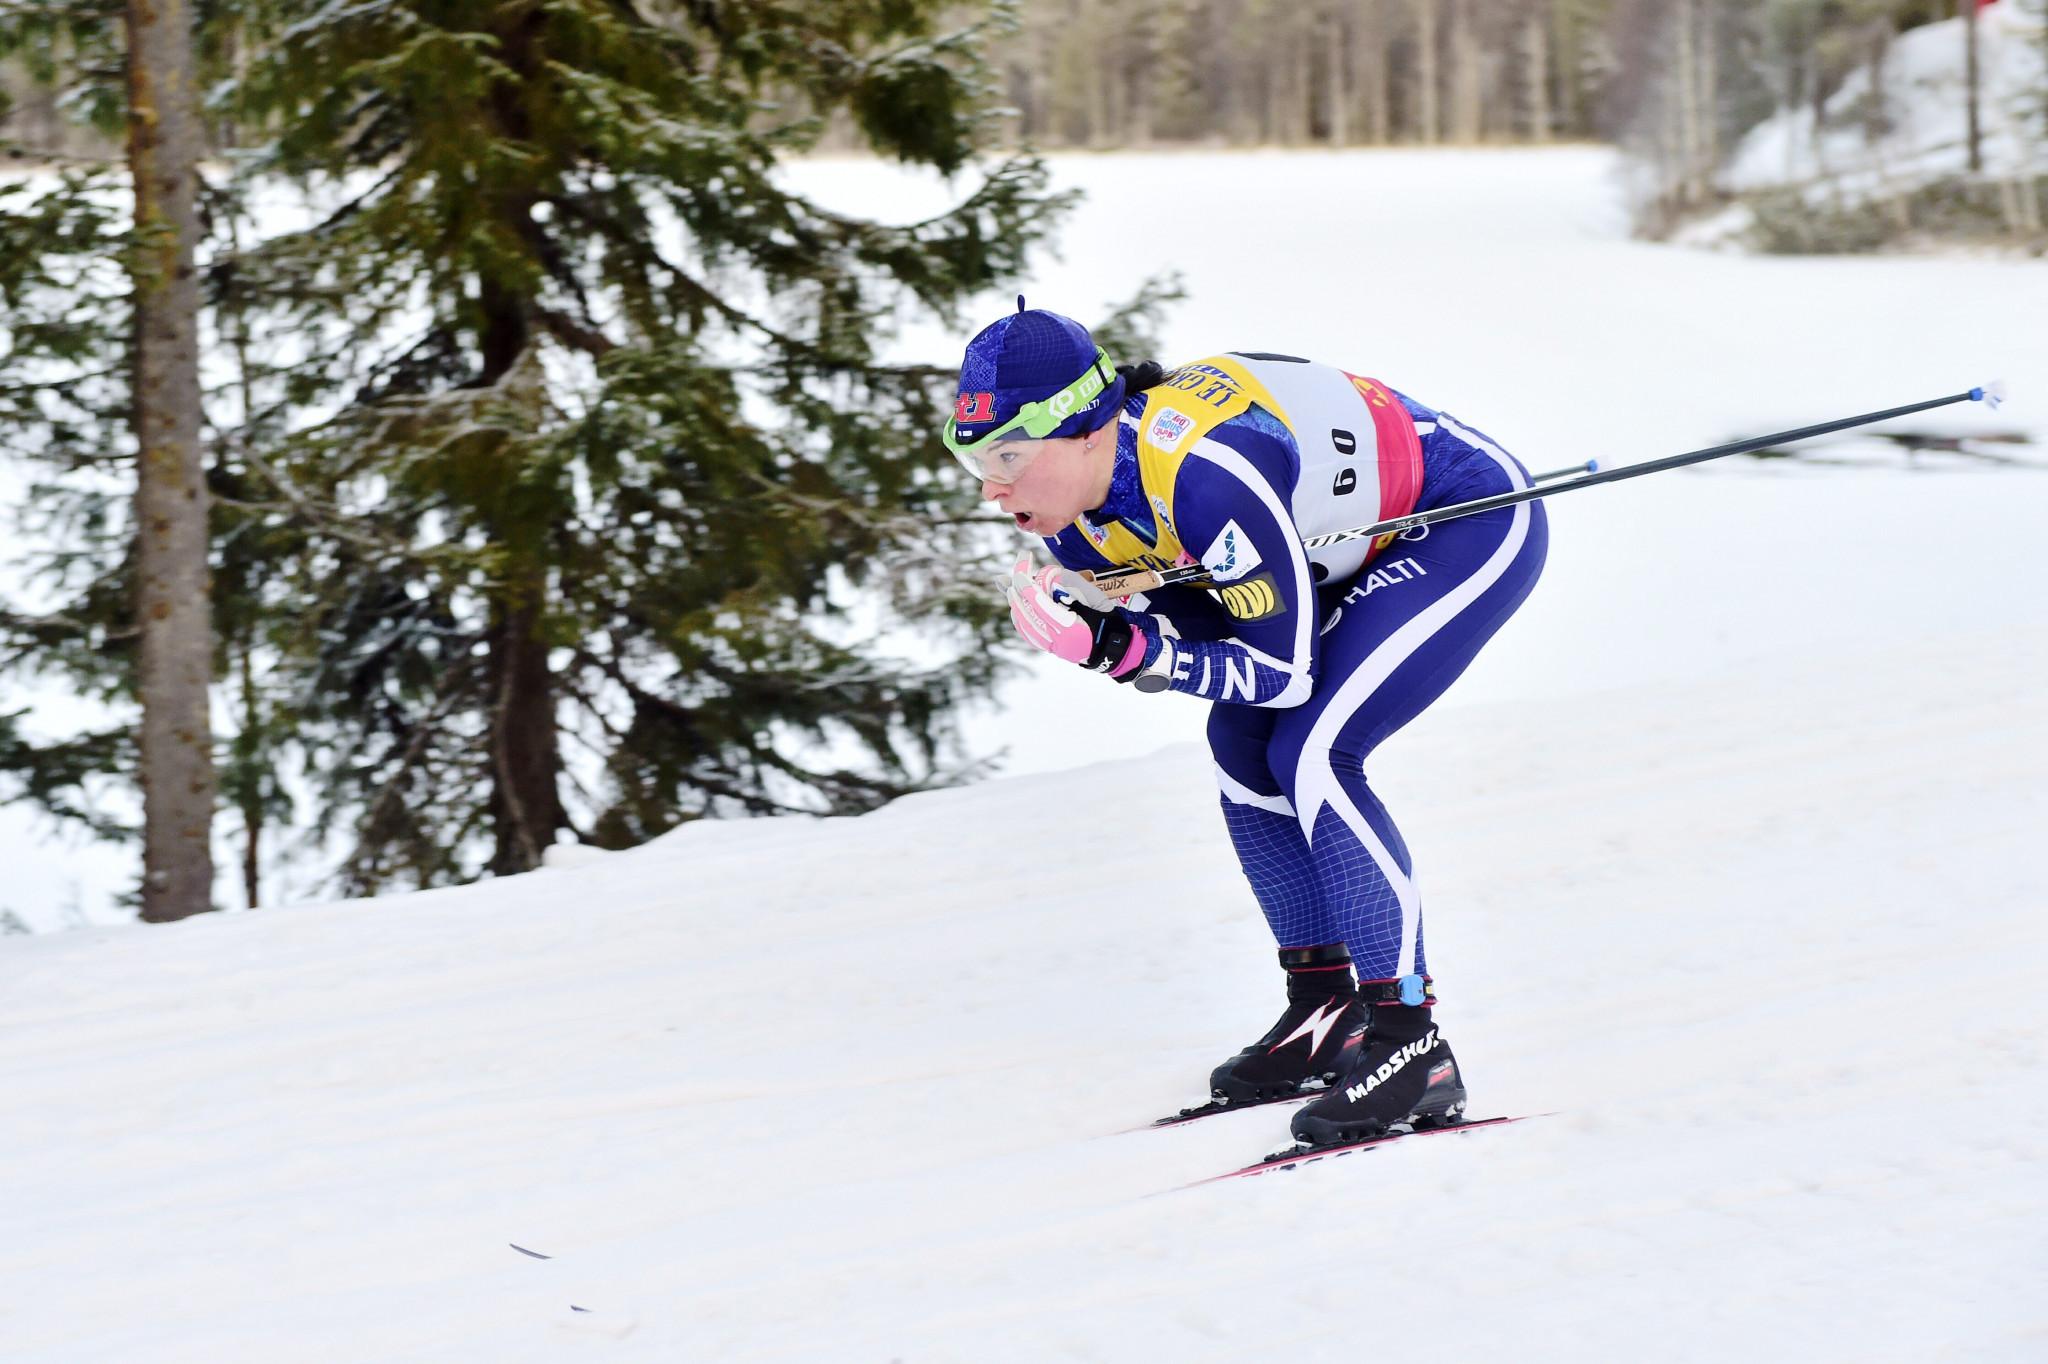 FInland's Krista Pärmäkoski will compete in the FIS Tour de Ski, starting tomorrow in Toblach ©Getty Images